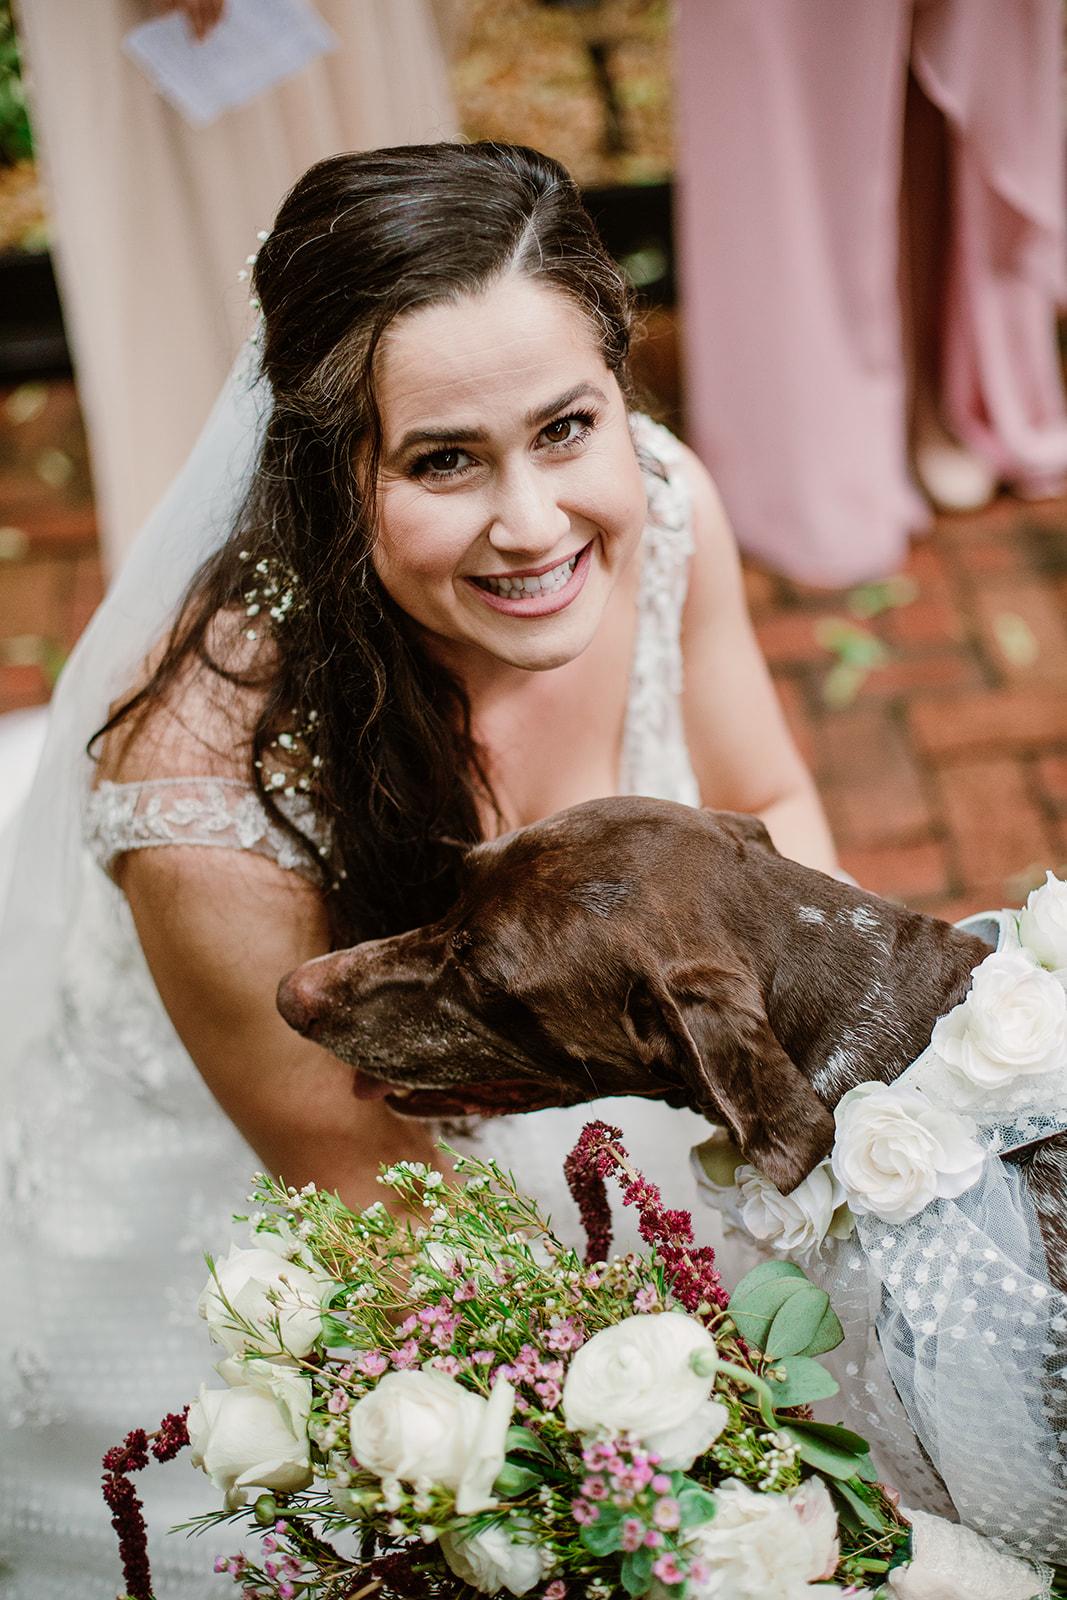 SarahMattozziPhotography-EmilyColin-LindenRowInnWedding-WeddingParty-52.jpg